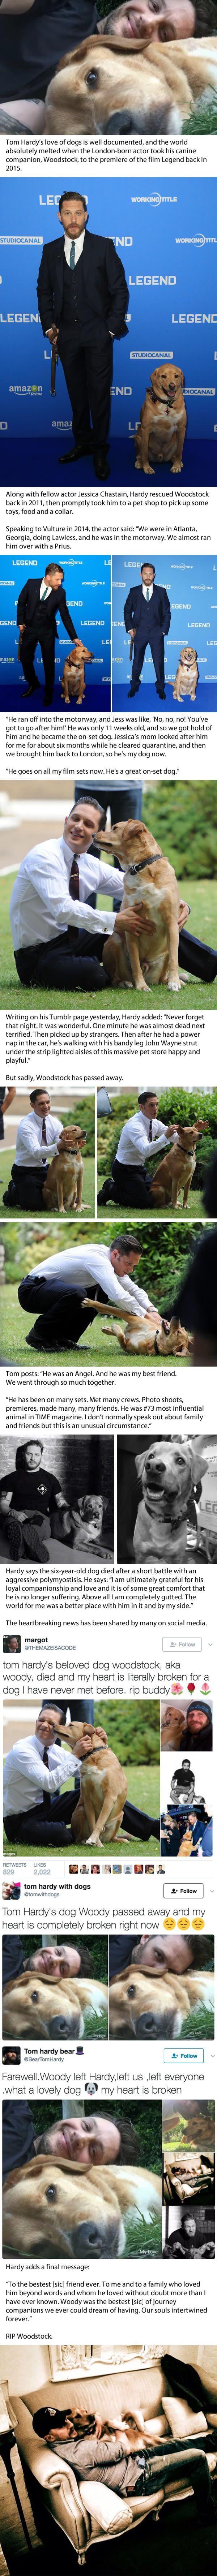 Sweet story.